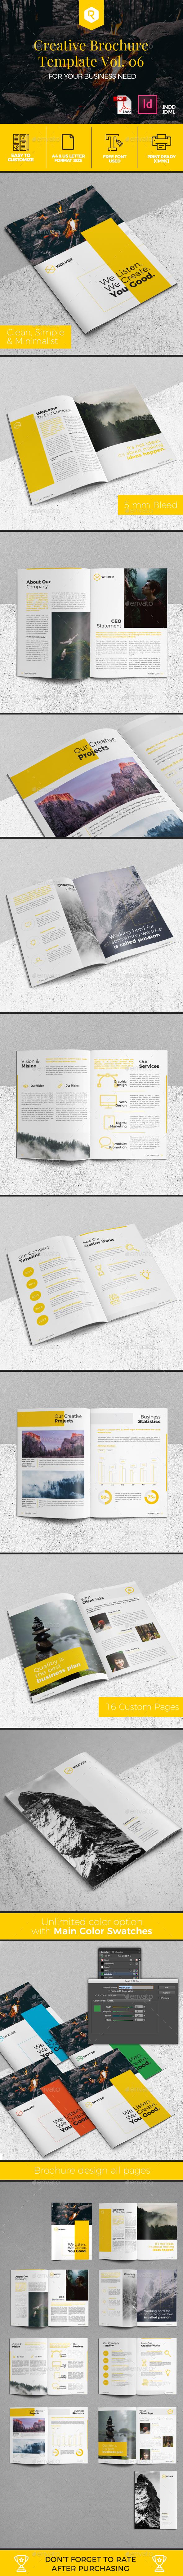 Creative Brochure Template Vol. 06 - Corporate Brochures